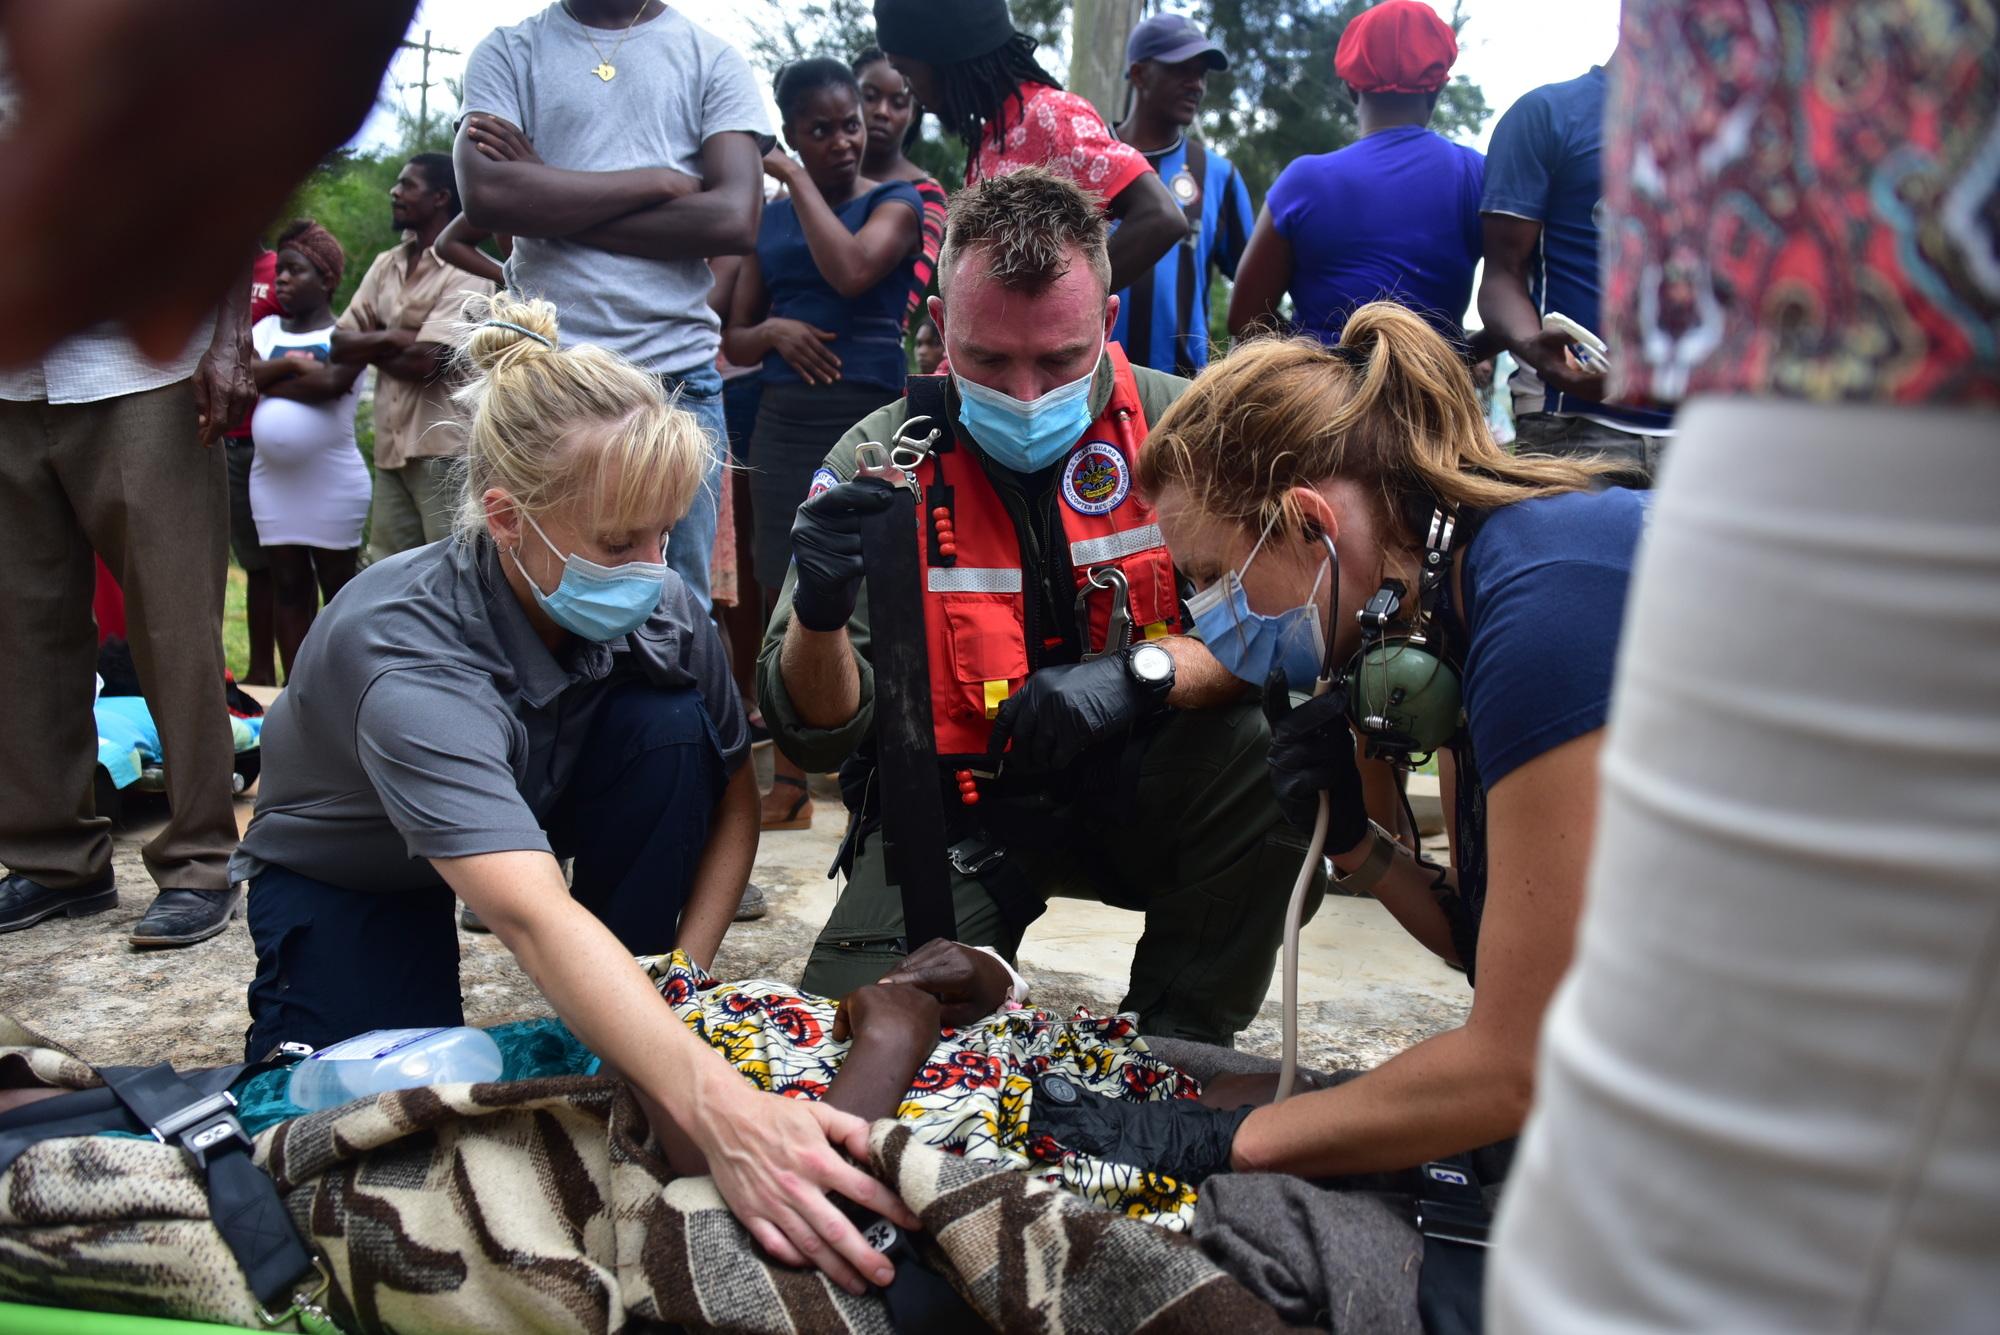 Coast Guard responds to Haiti with humanitarian aid